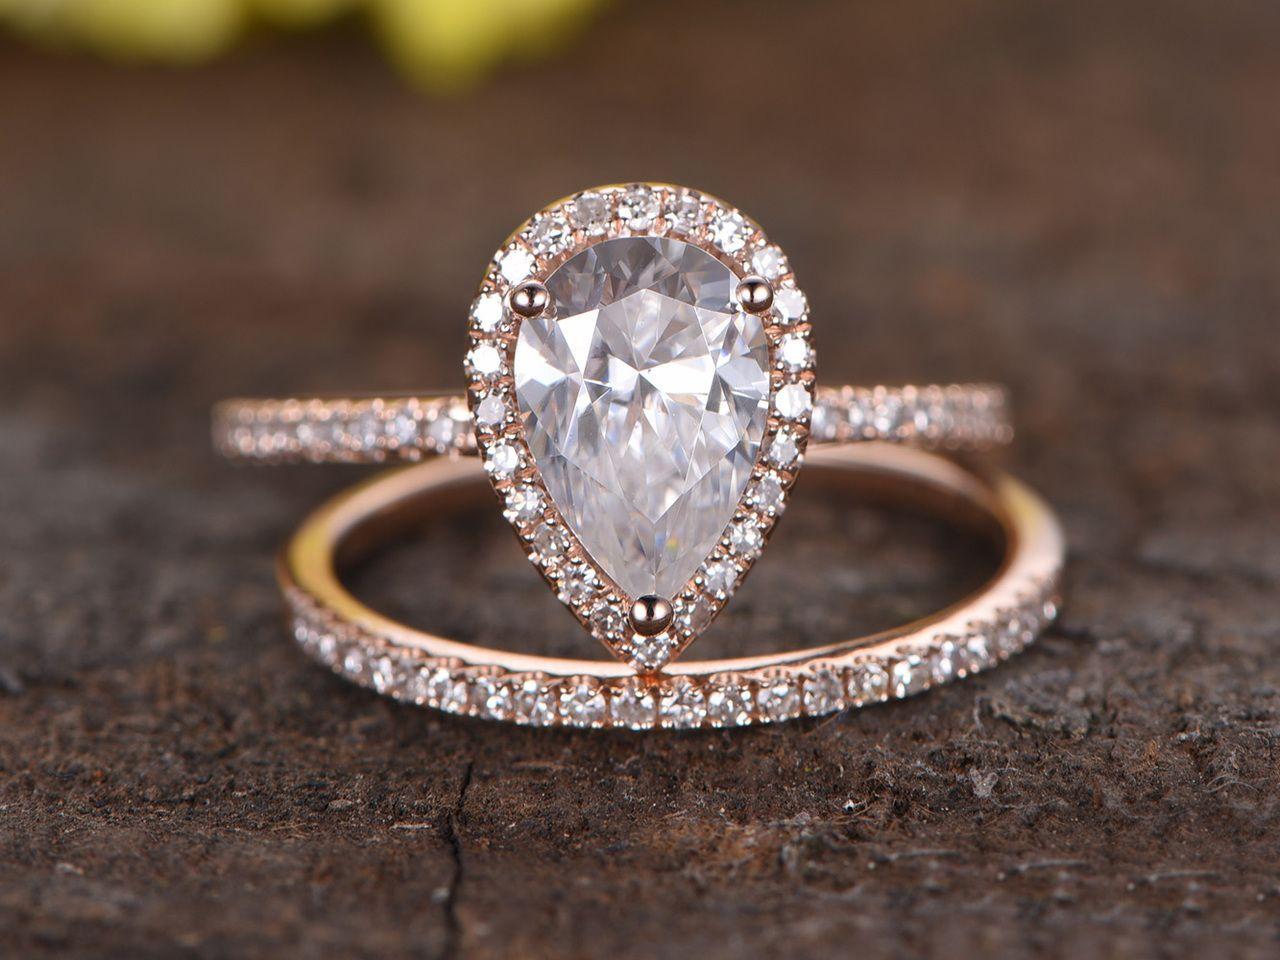 1.5 Carat Pear Shaped Moissanite Engagement Ring Set ...